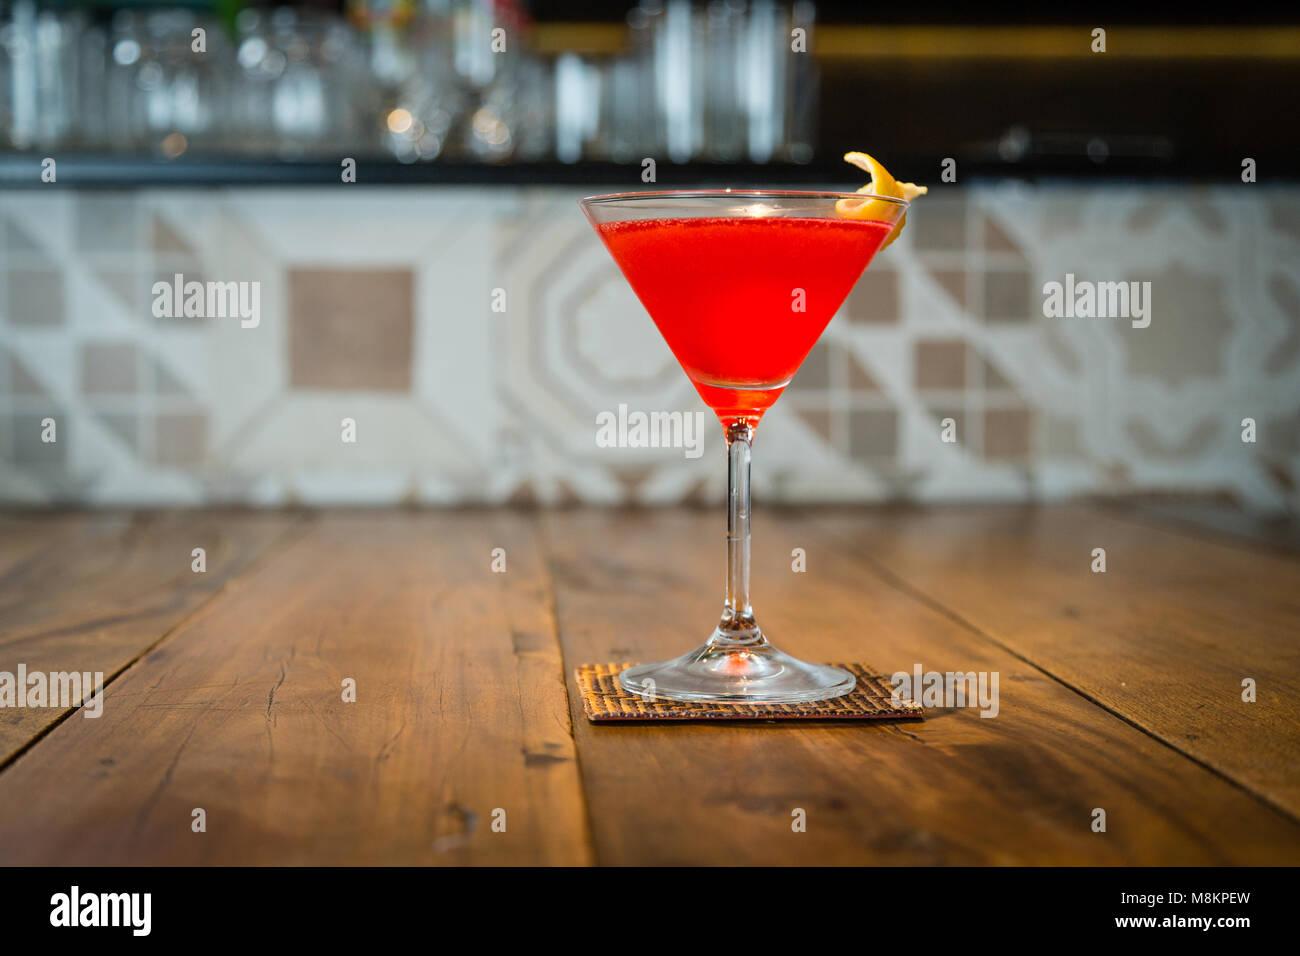 Bebidas os del mundo - Foto de stock